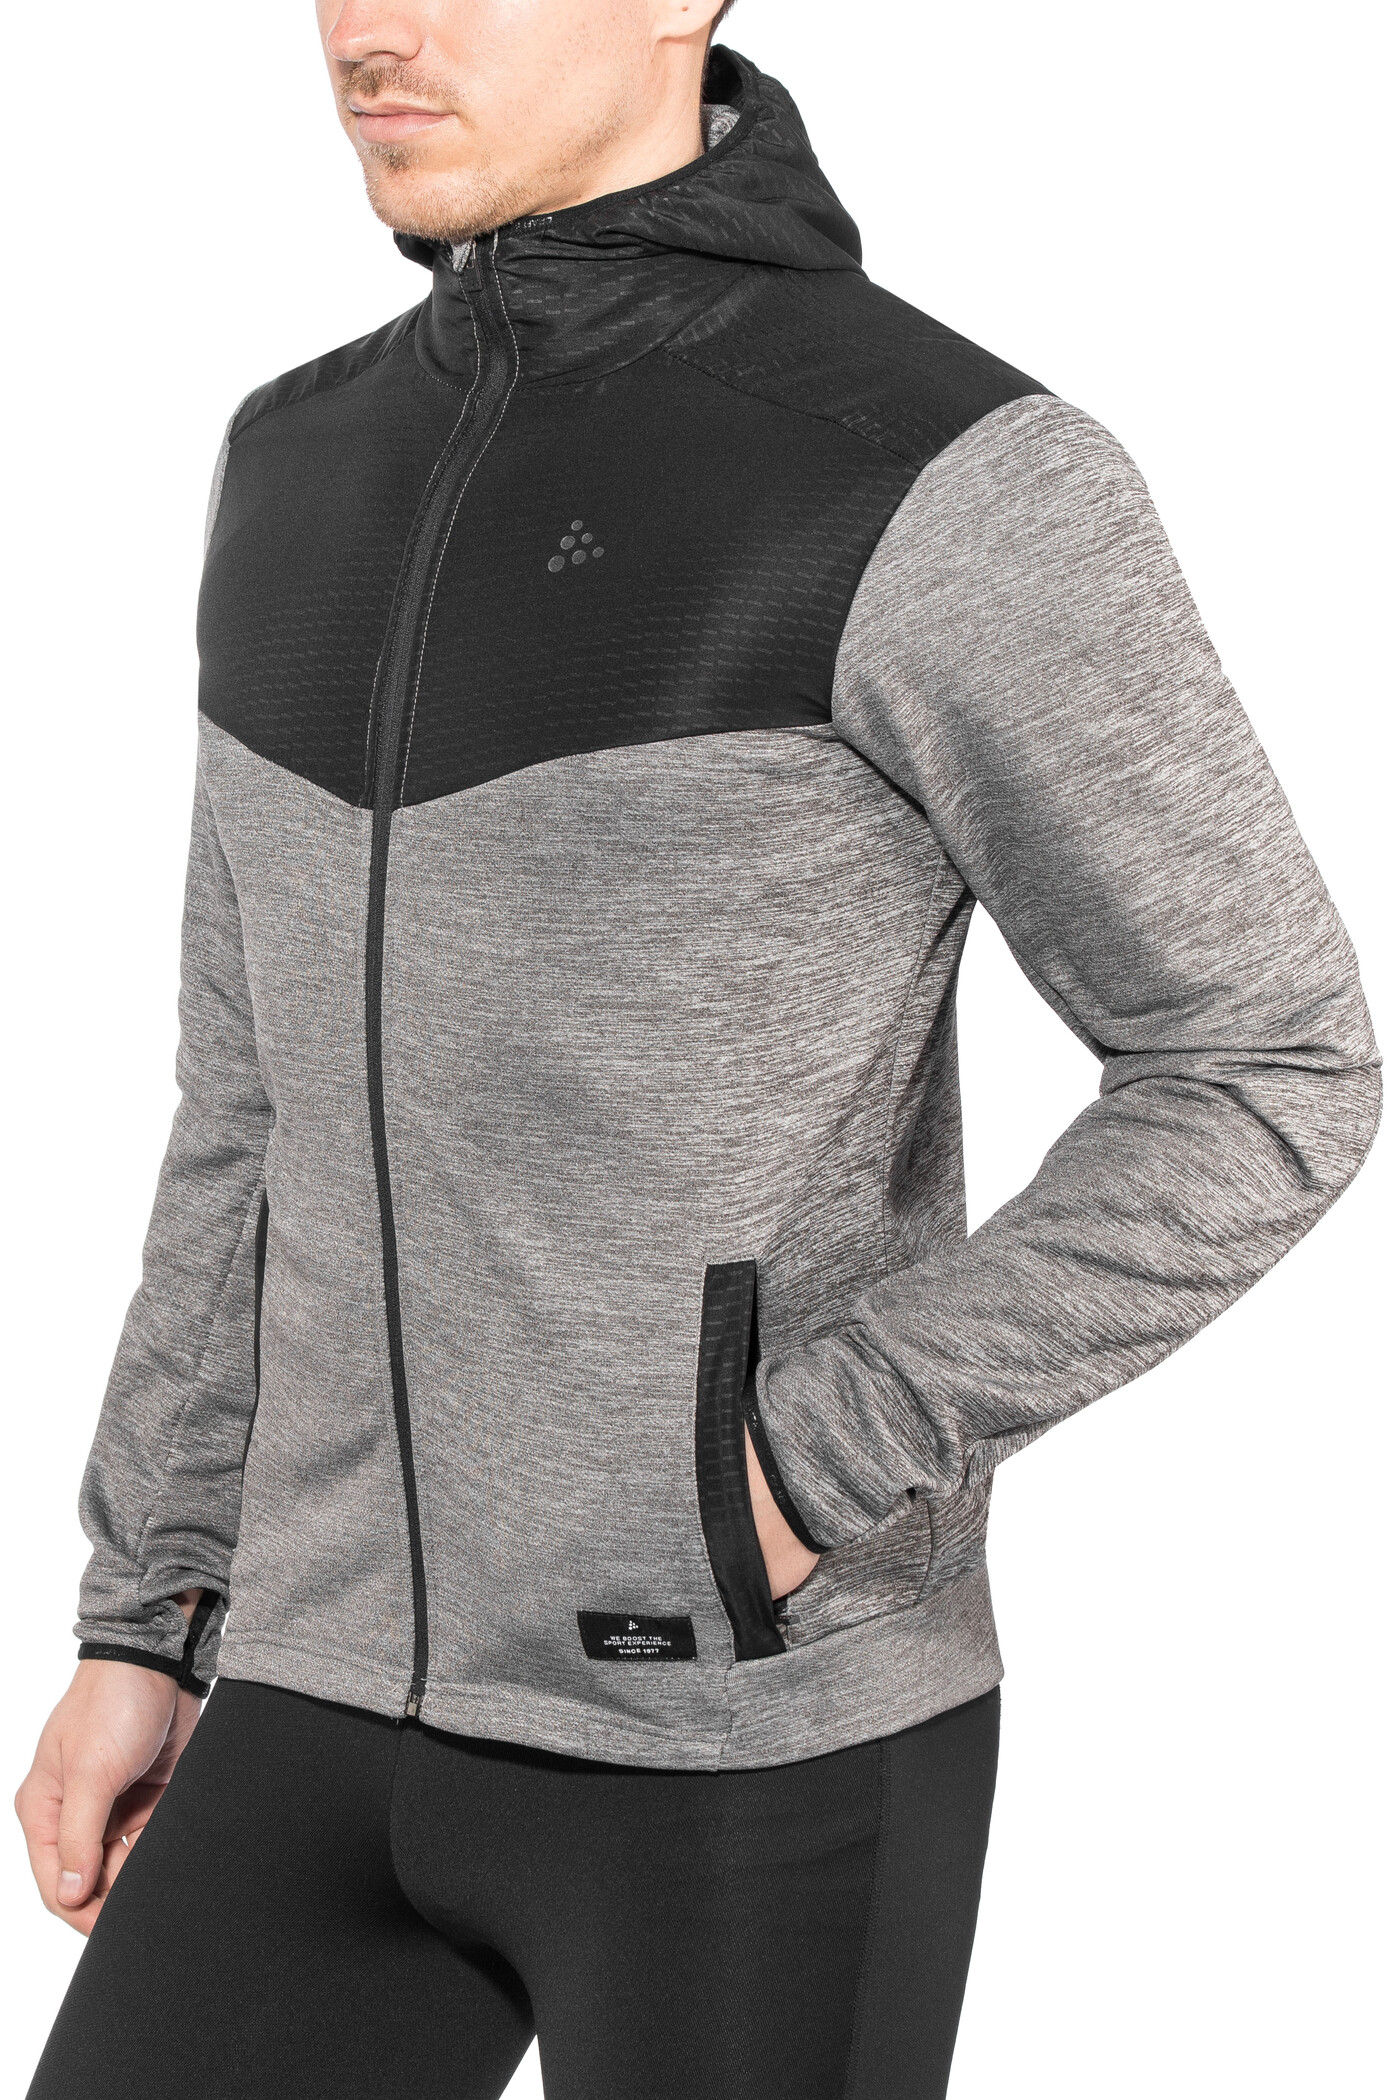 Craft Breakaway Løbejakke Herrer, dk grey melange | Jackets